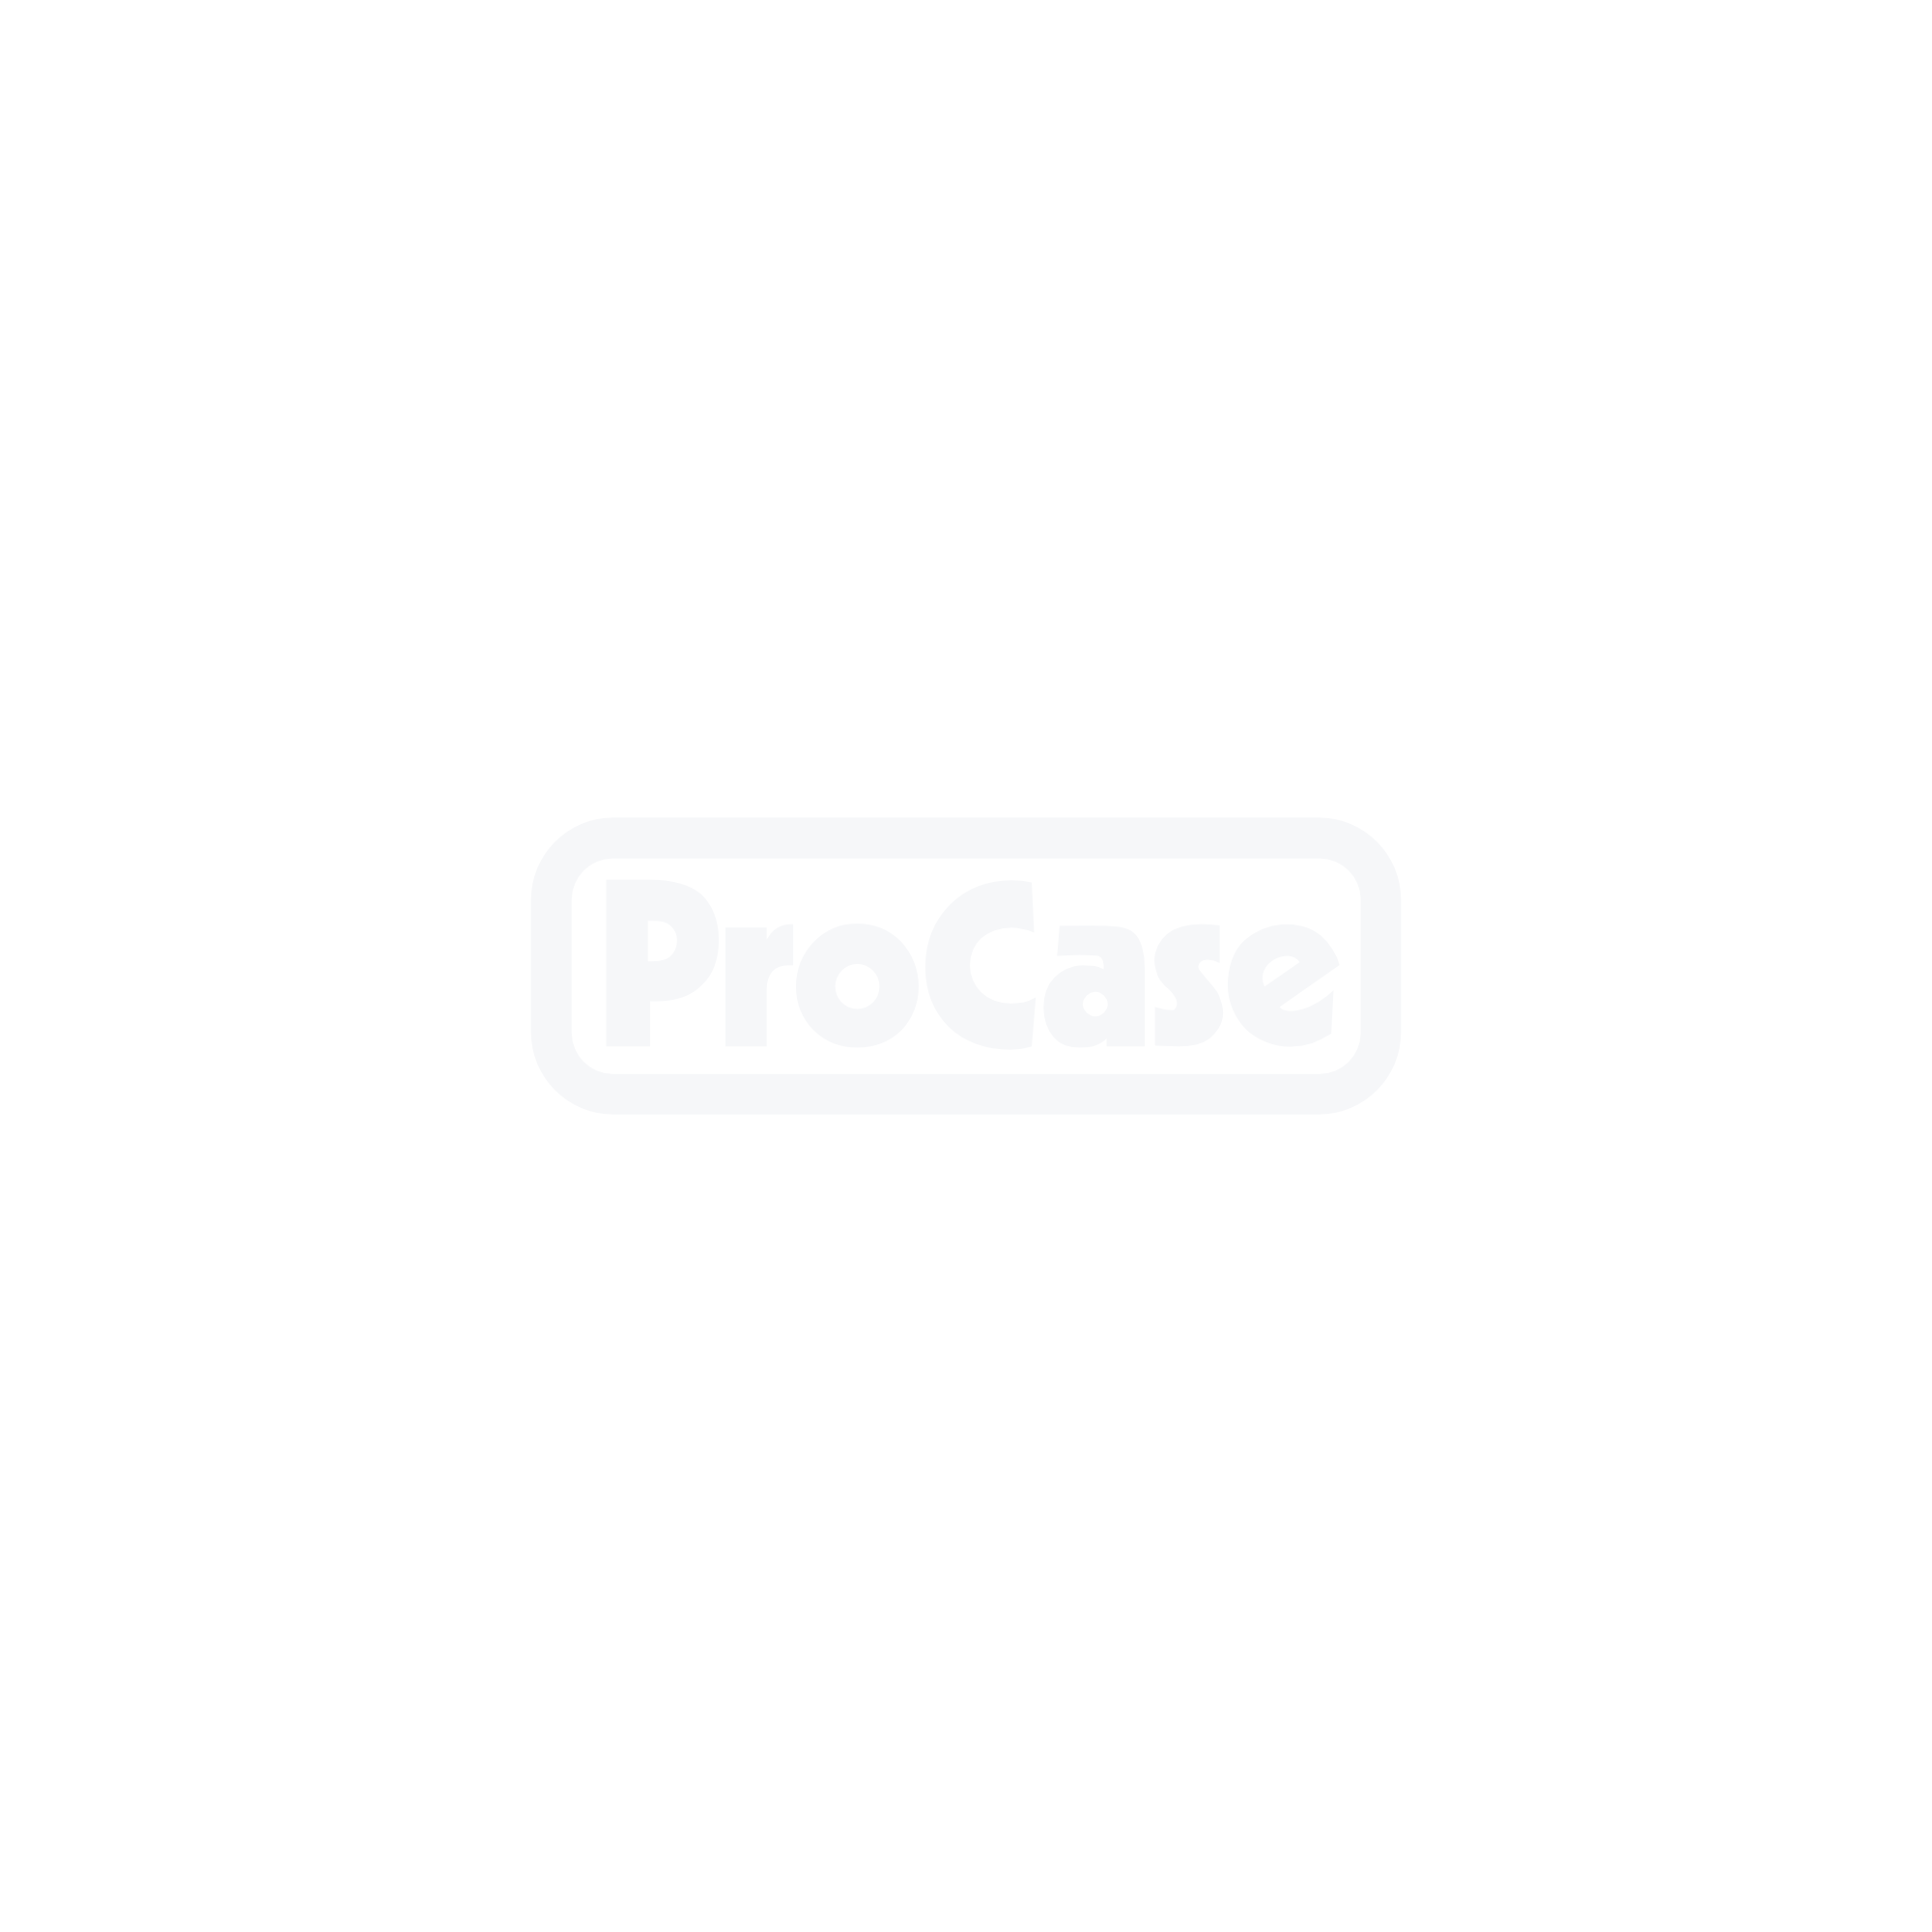 SKB 3R Koffer 2216-15B leer